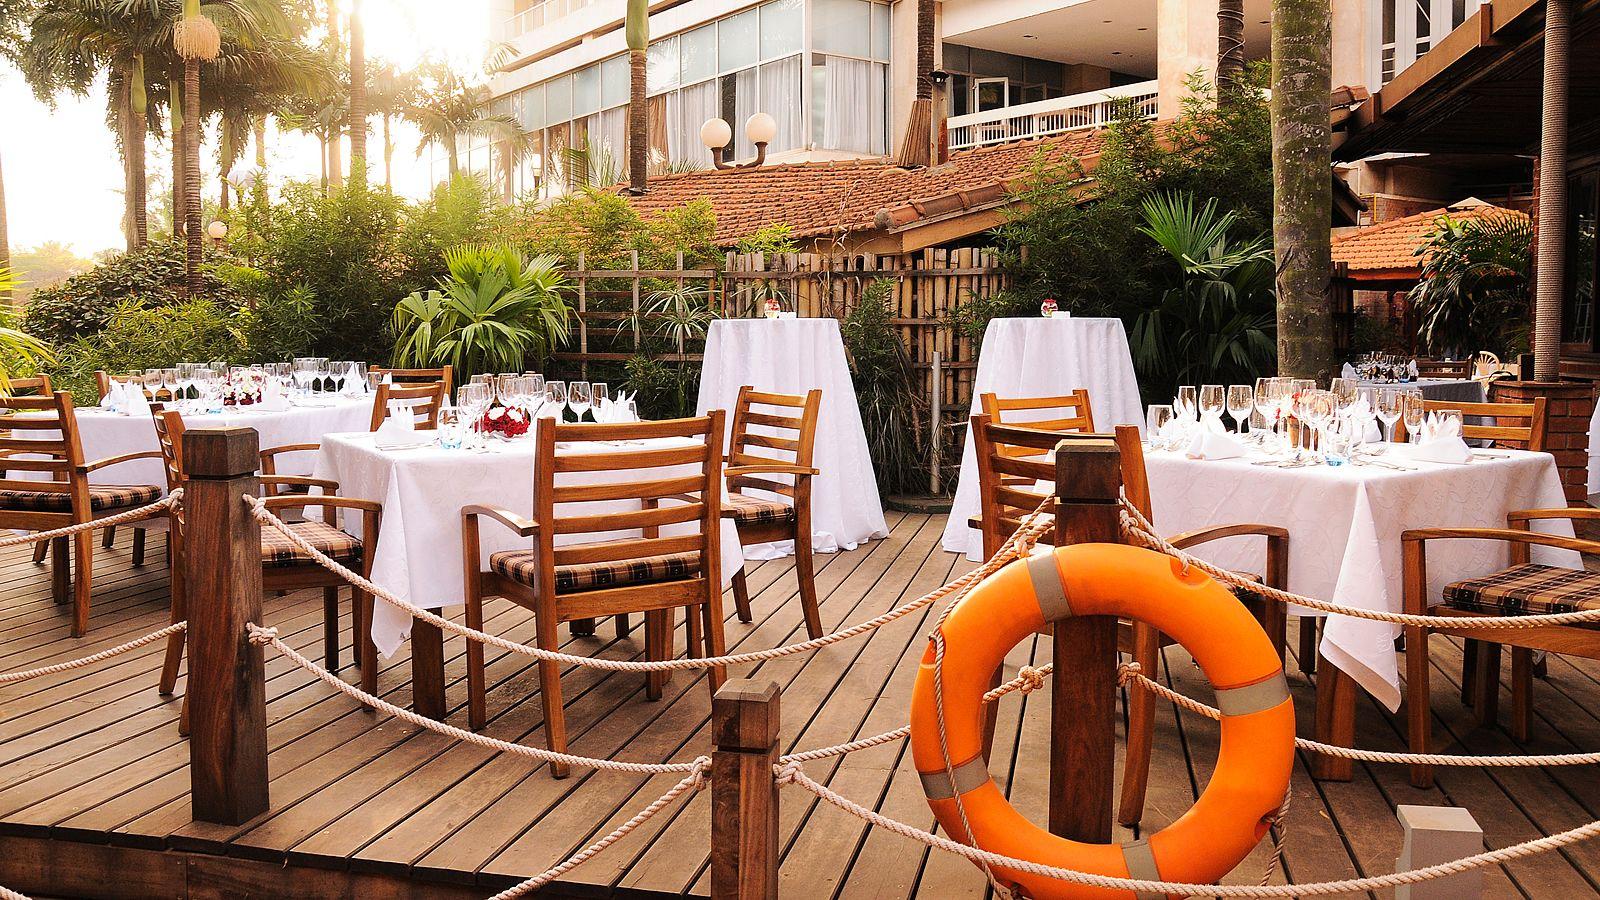 Sheraton Hotel Seven Seas Restaurant Outside Deck